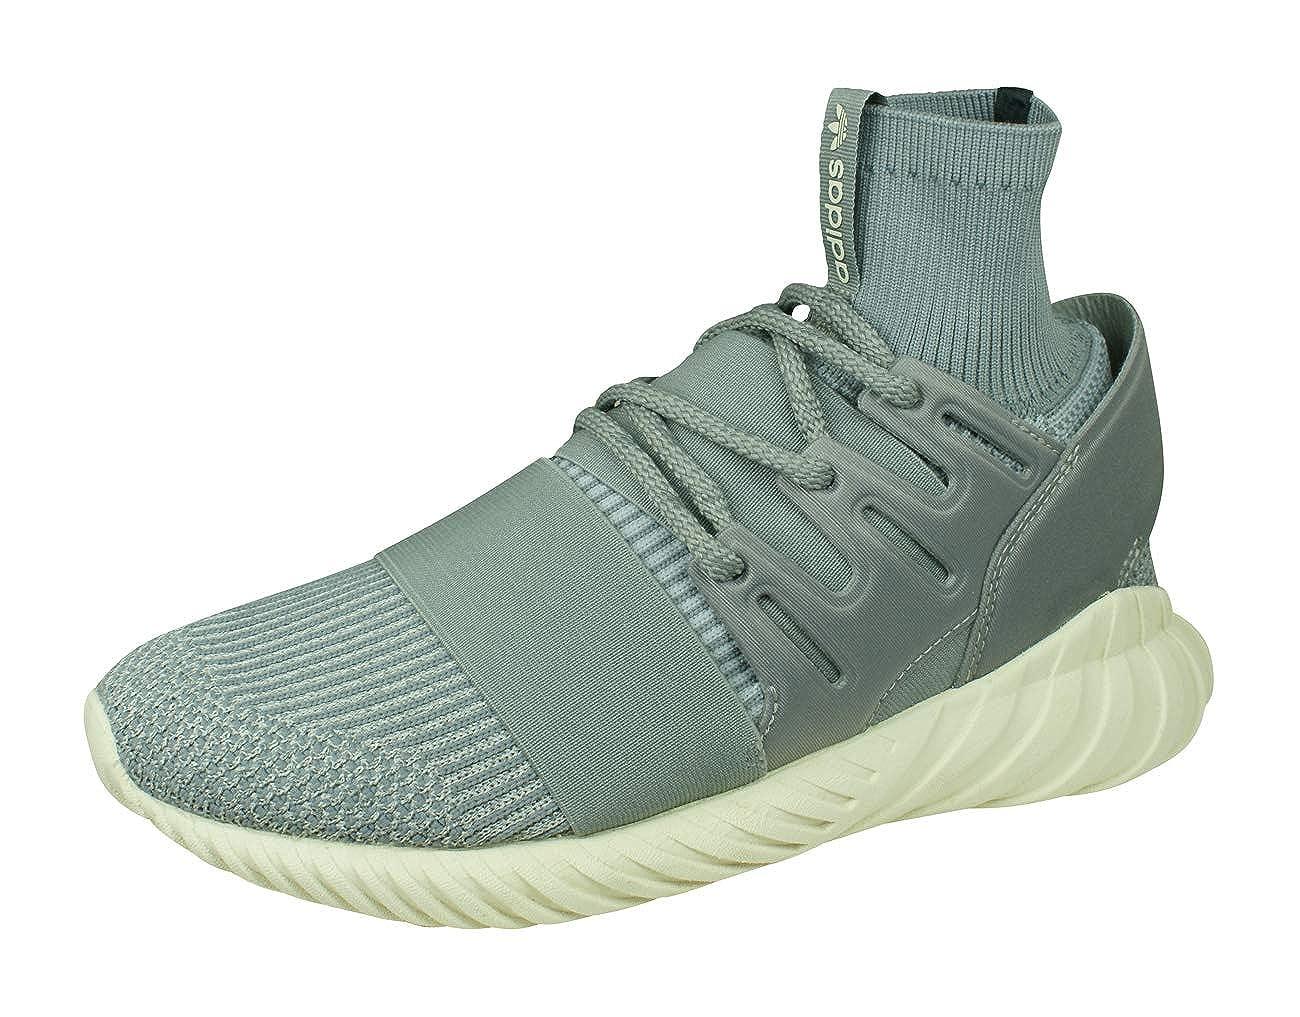 MultiCouleure (Grpumg     Grpumg   Blacre) adidas Tubular Doom PK, Chaussures de Sport Homme 438